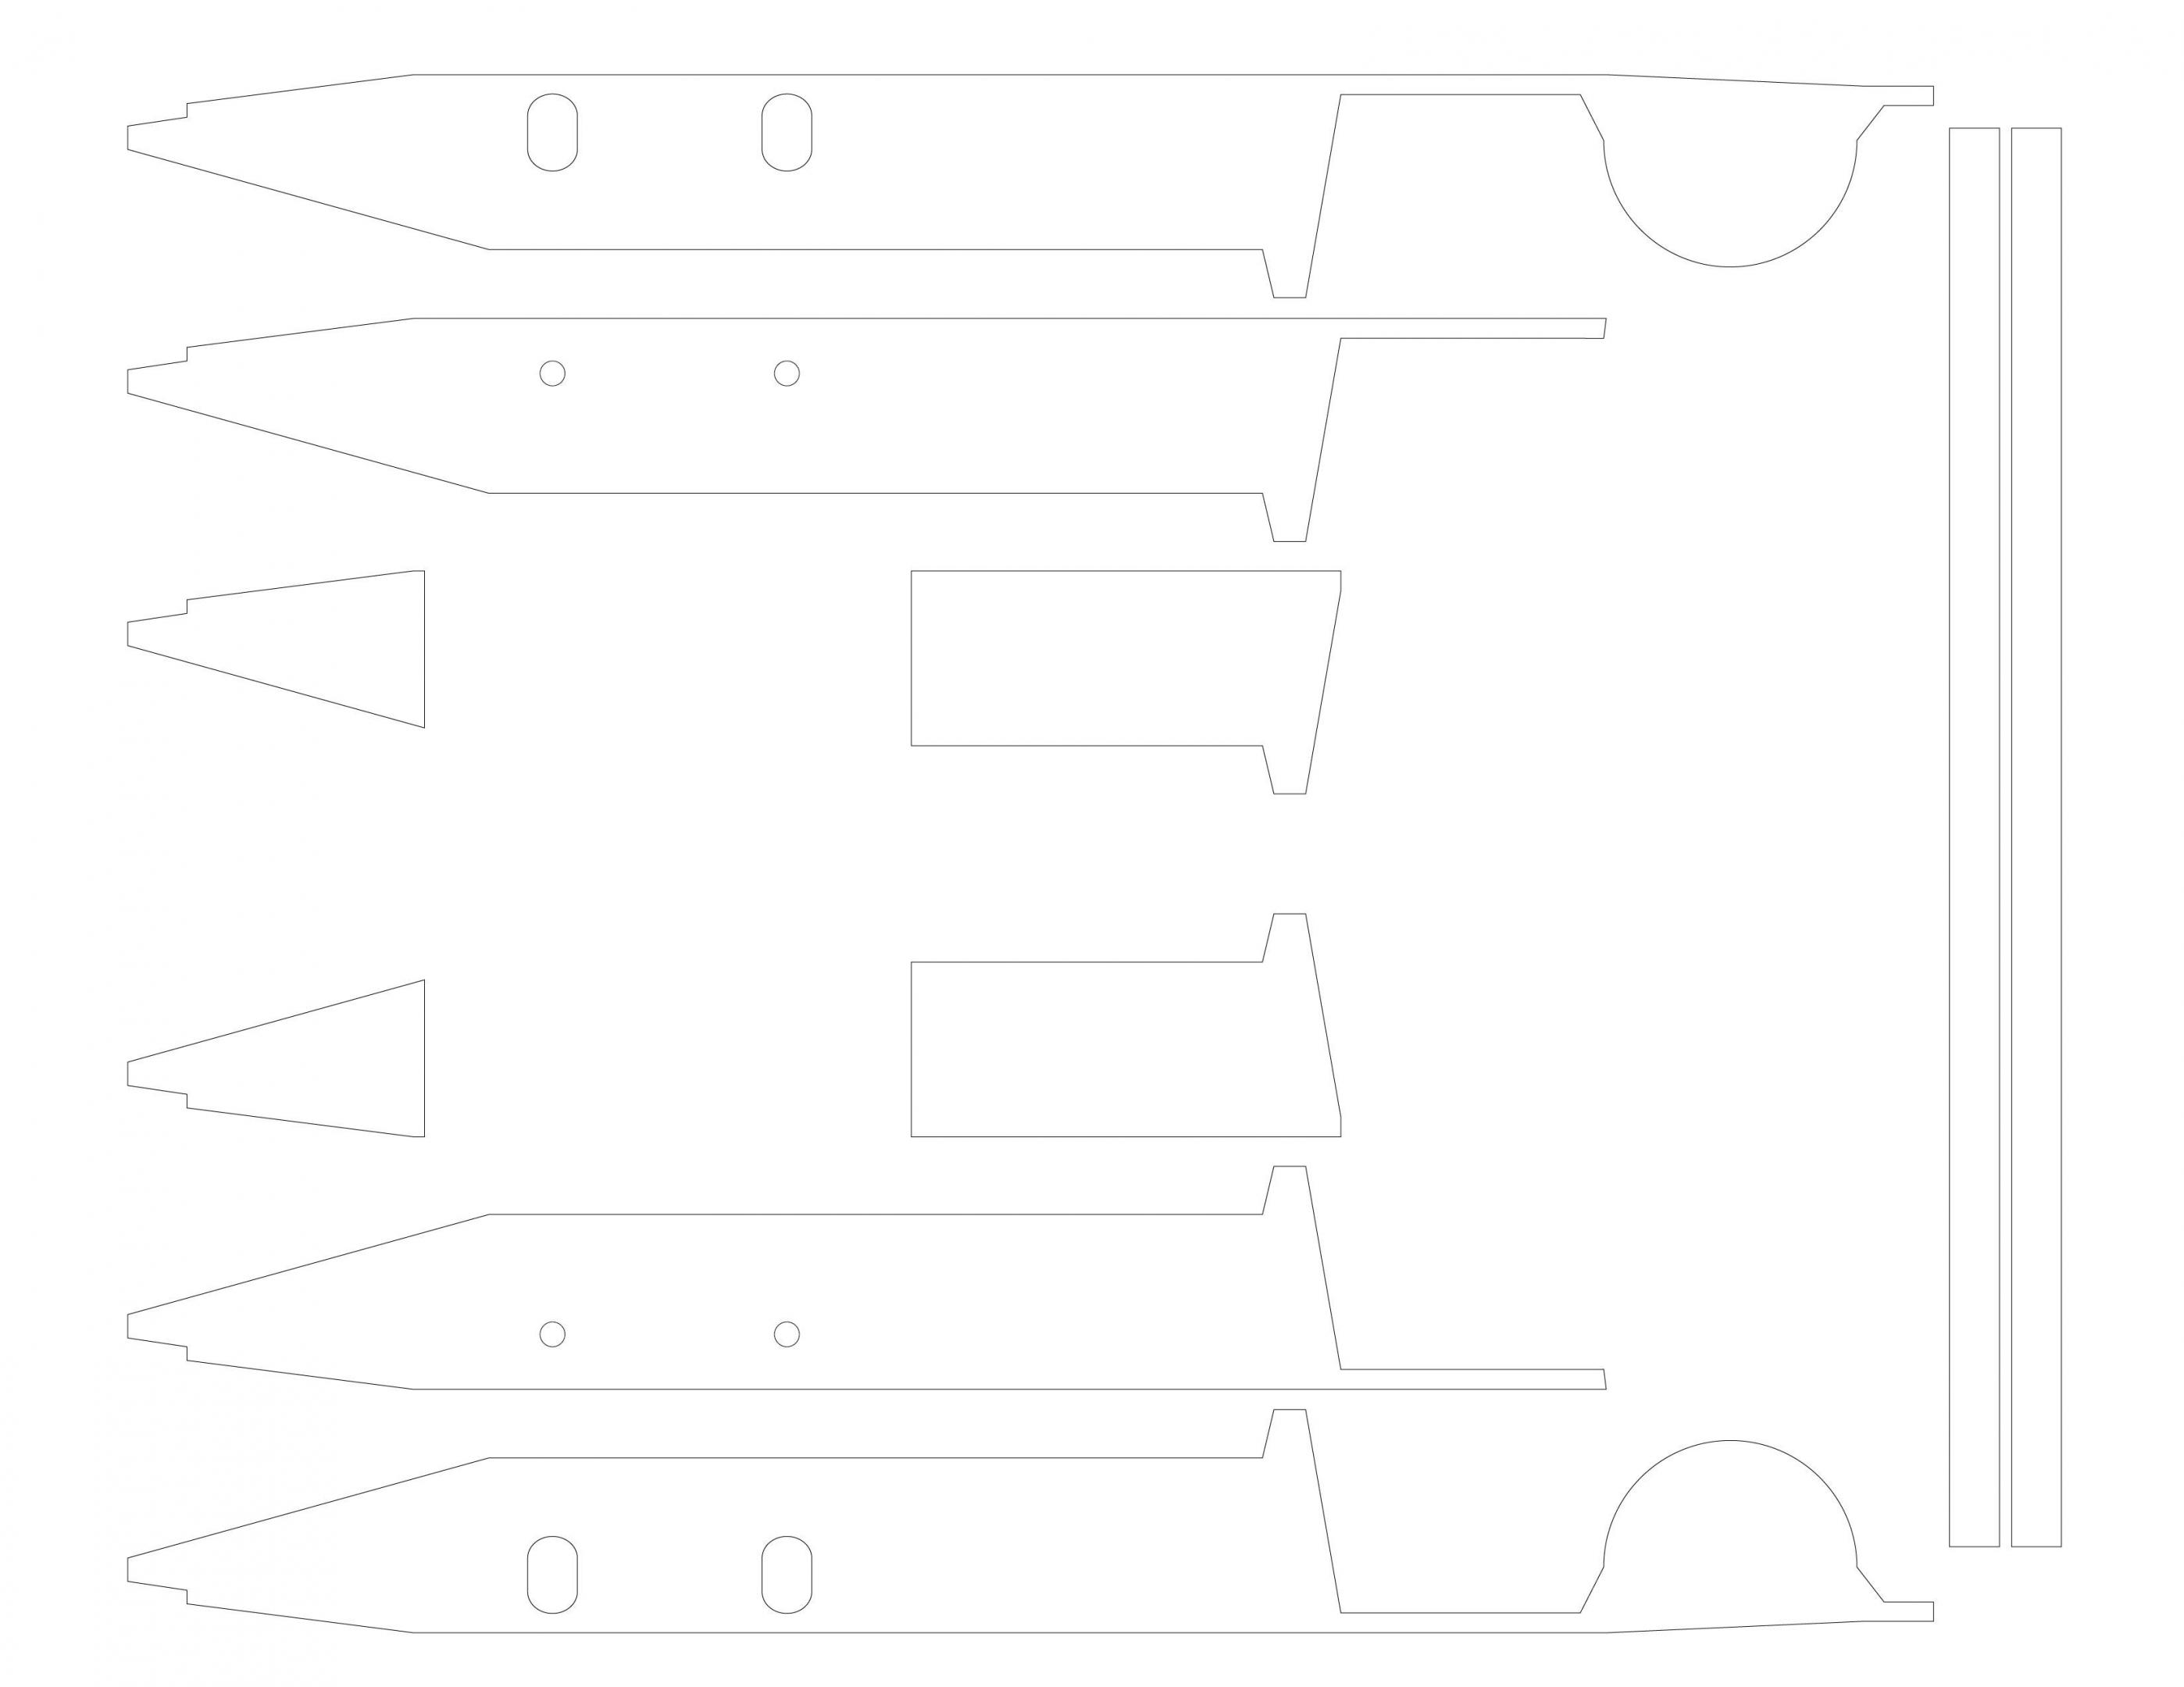 HaulerLayout-02.thumb.jpg.7fd5886d33f348c7f4b07e69c4991818.jpg